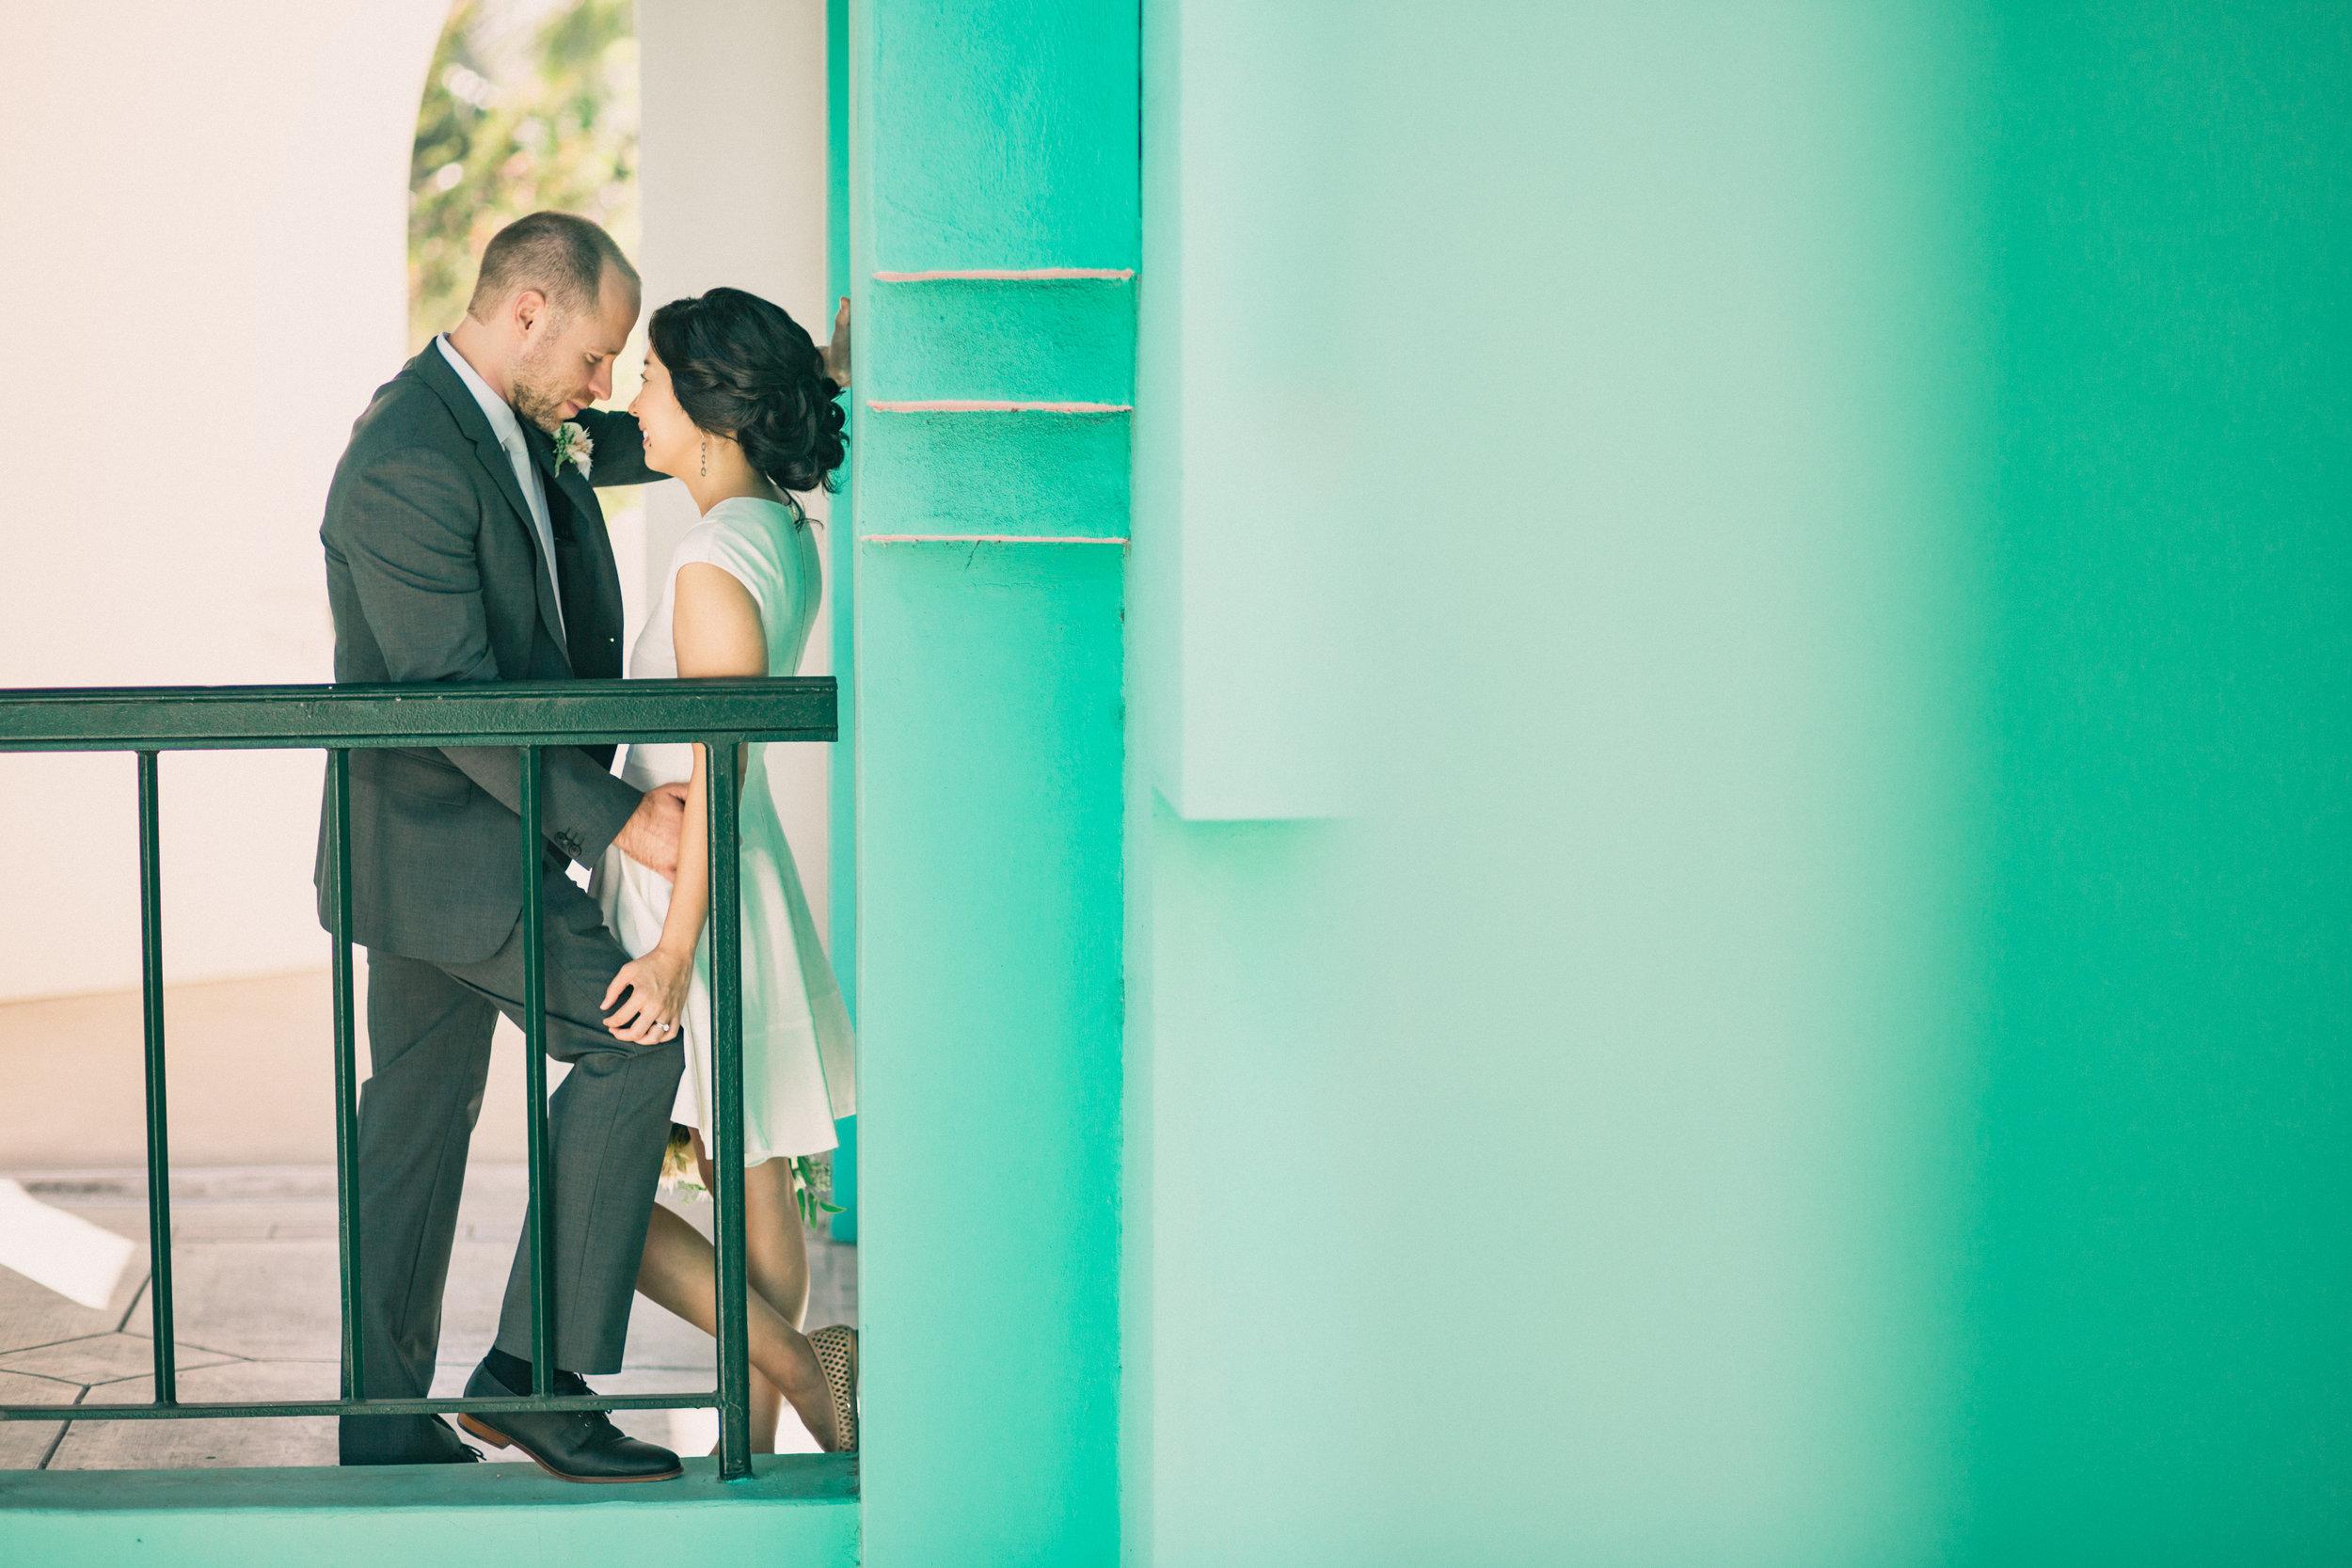 Beverly_Hills_Wedding-43.jpg